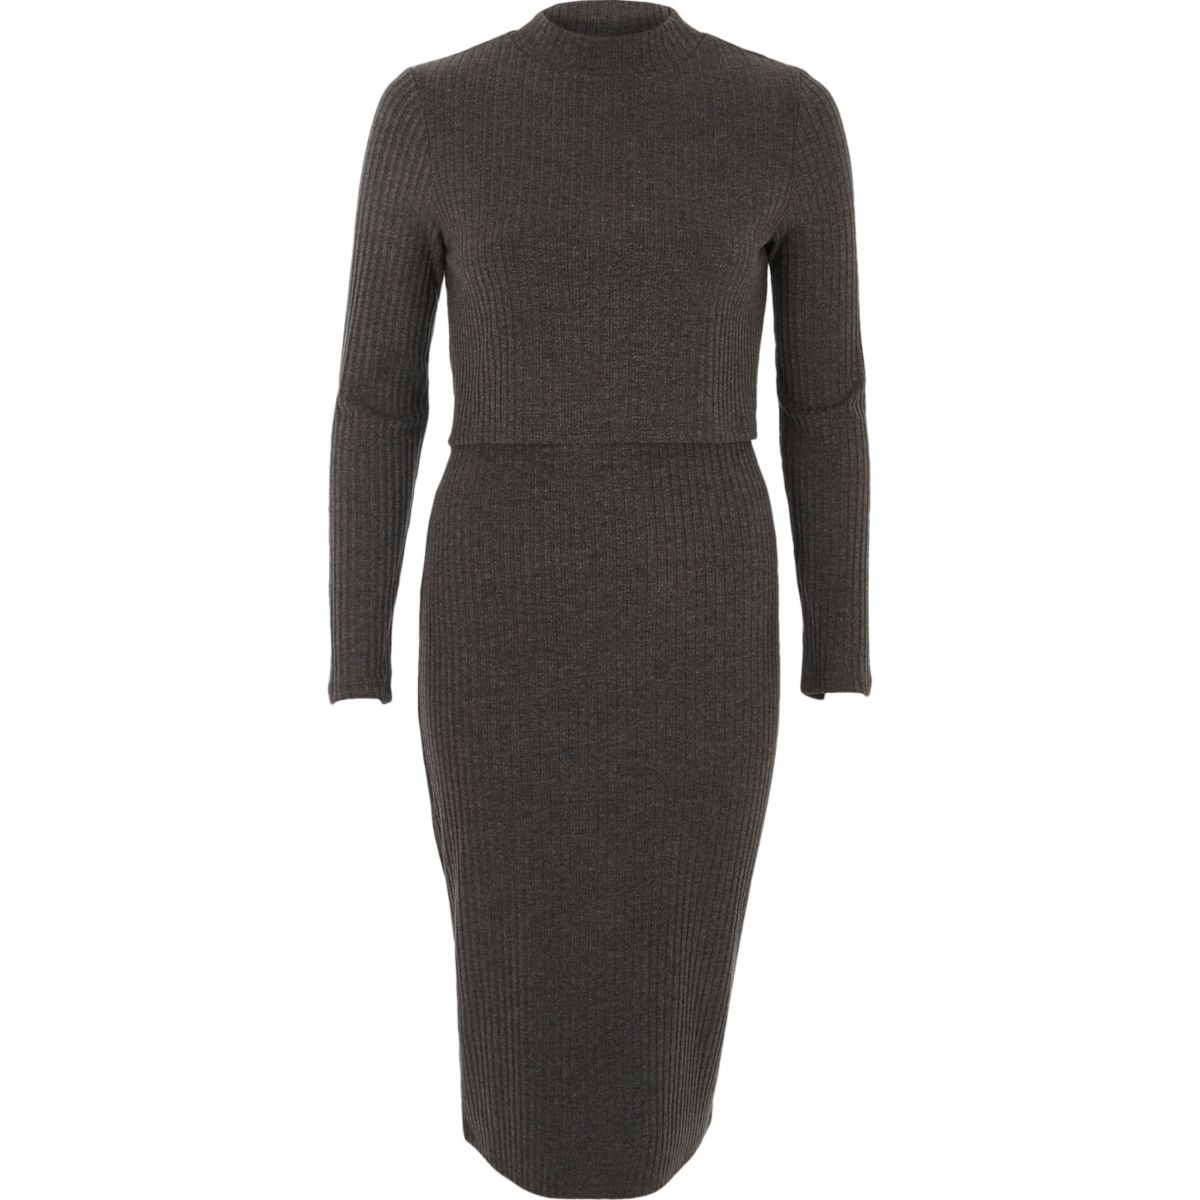 Dark grey ribbed high neck layered midi dress